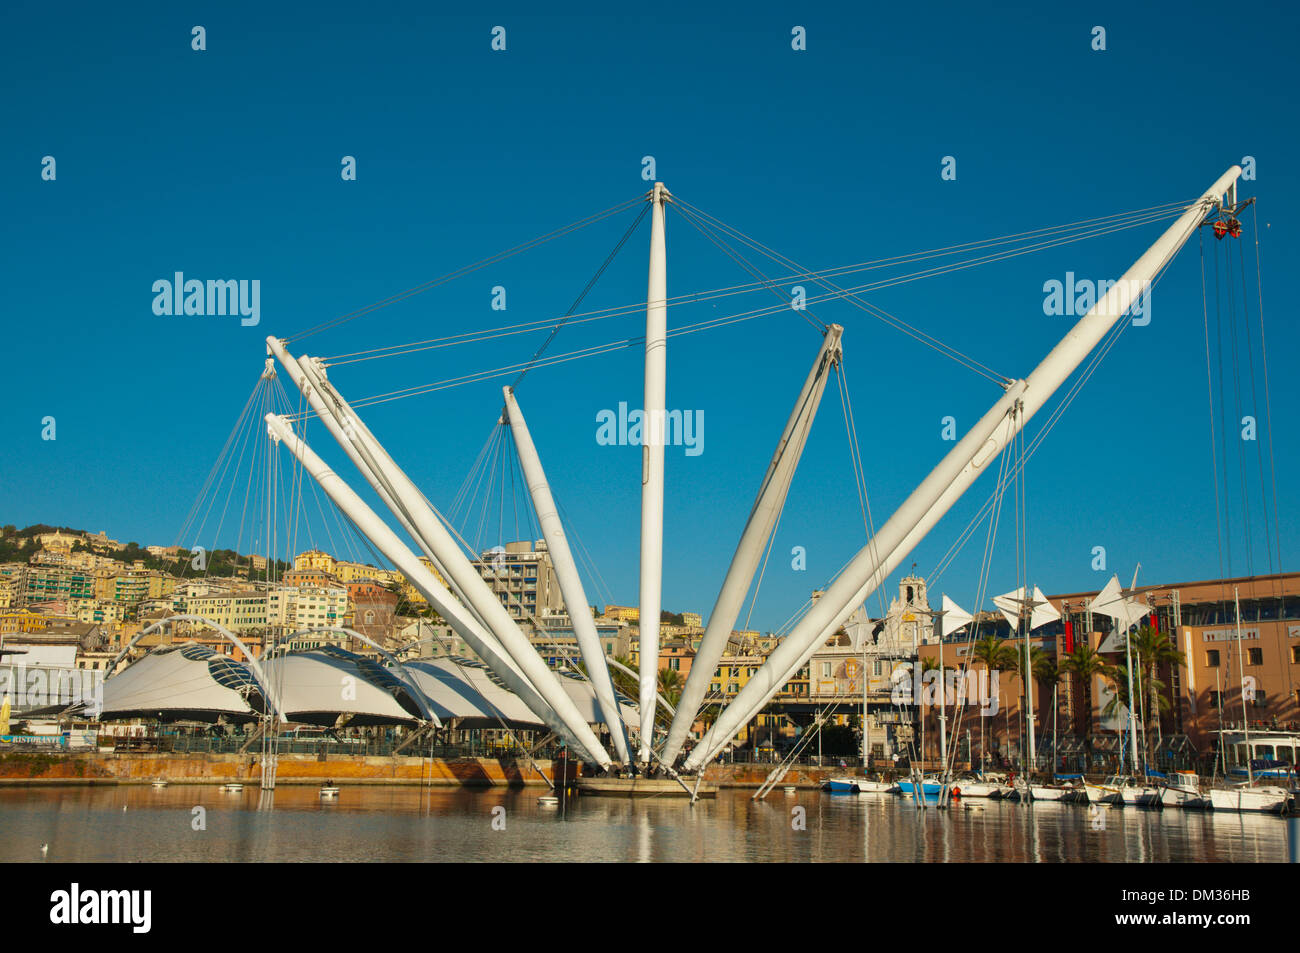 Bigo by Renzo Piano in Porto Antico the old port Genoa Liguria region Italy Europe - Stock Image